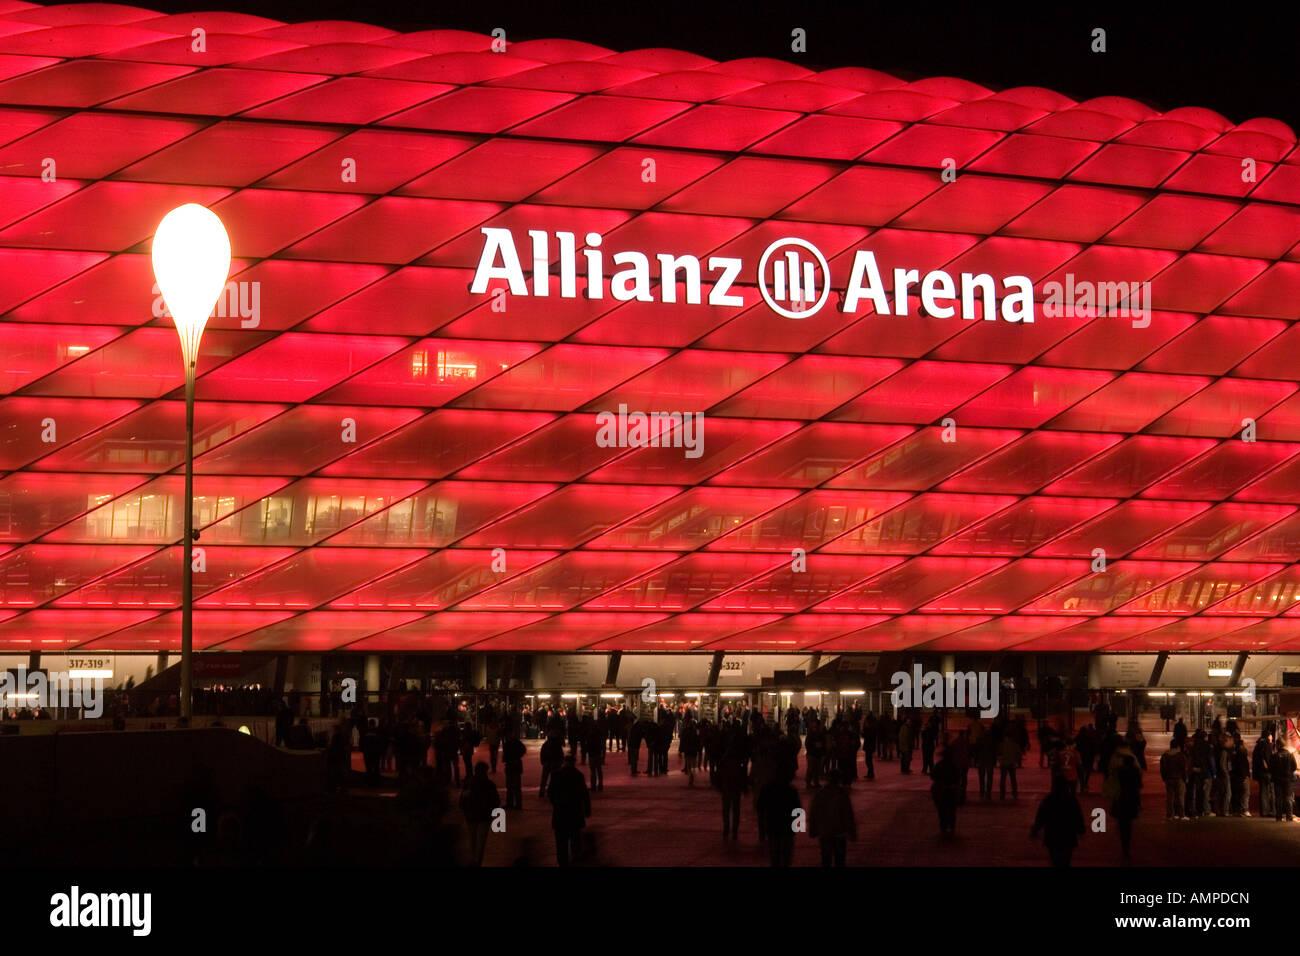 EU DE Germany Bavaria Munich The illuminated football stadion EU DE Germany Bavaria Munich - Stock Image